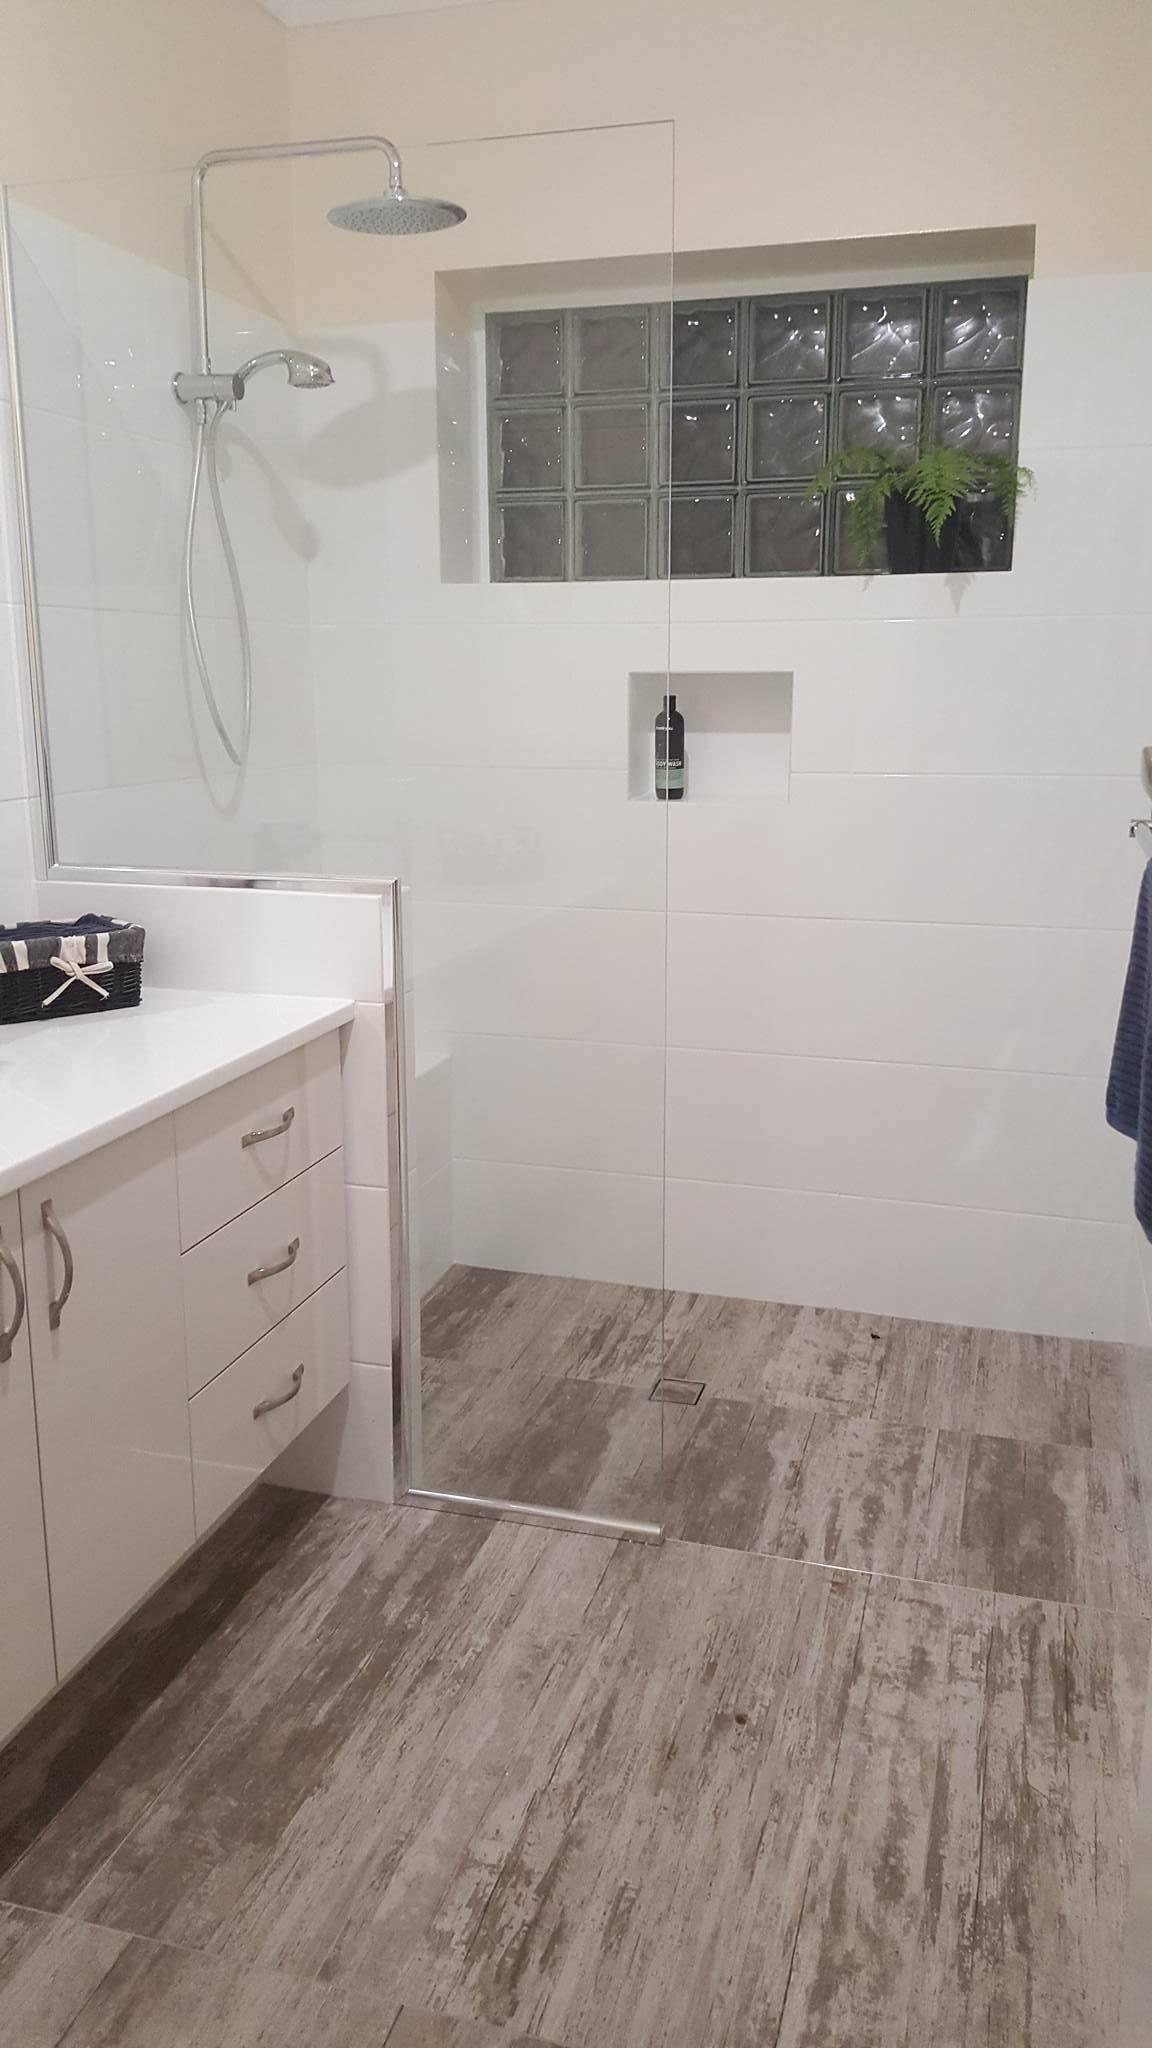 Bathroom Renovations Joondalup veejay's - kitchen renovations & designs - joondalup